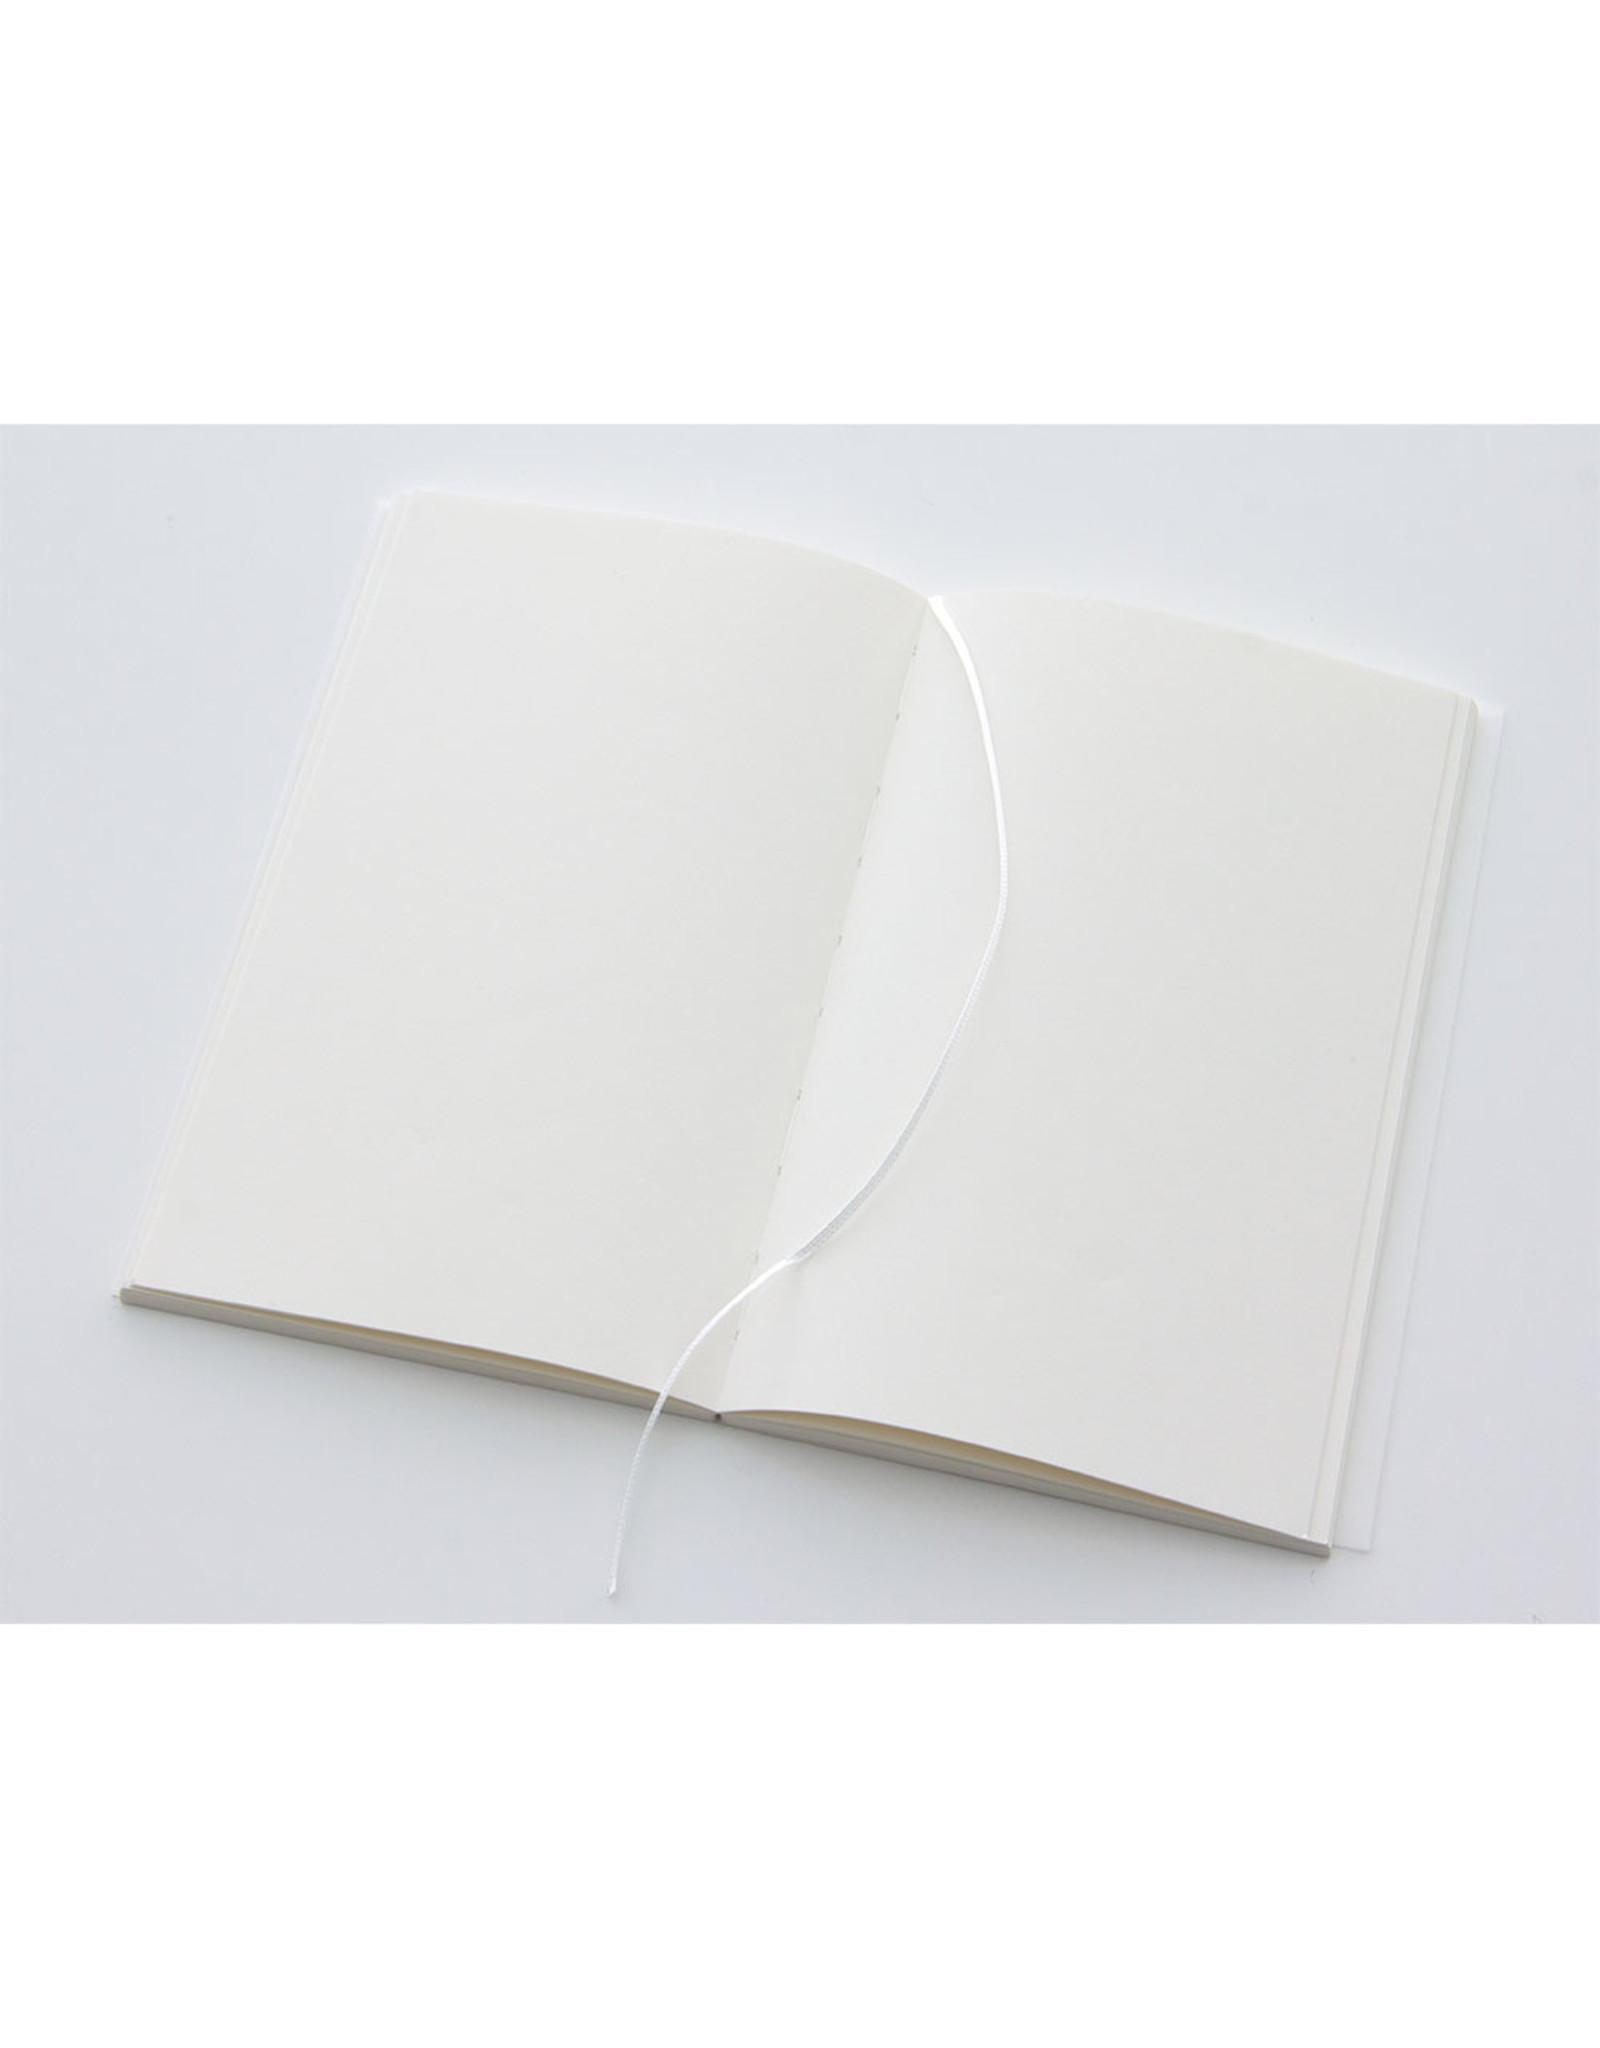 Designphil Inc. MD COTTON NOTEBOOK B6 SLIM  H175 × W105 × D10mm